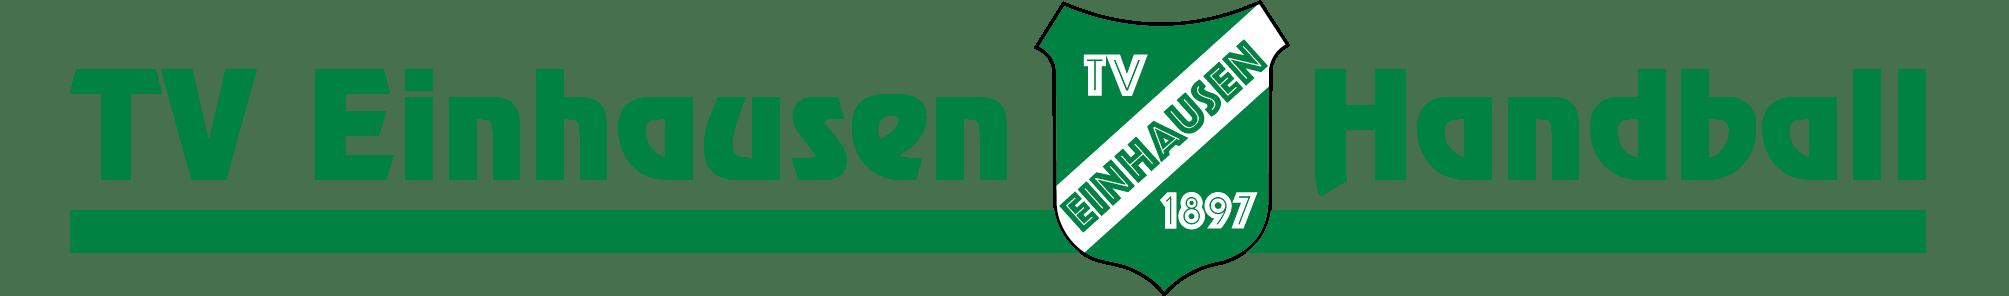 TV Einhausen Handball